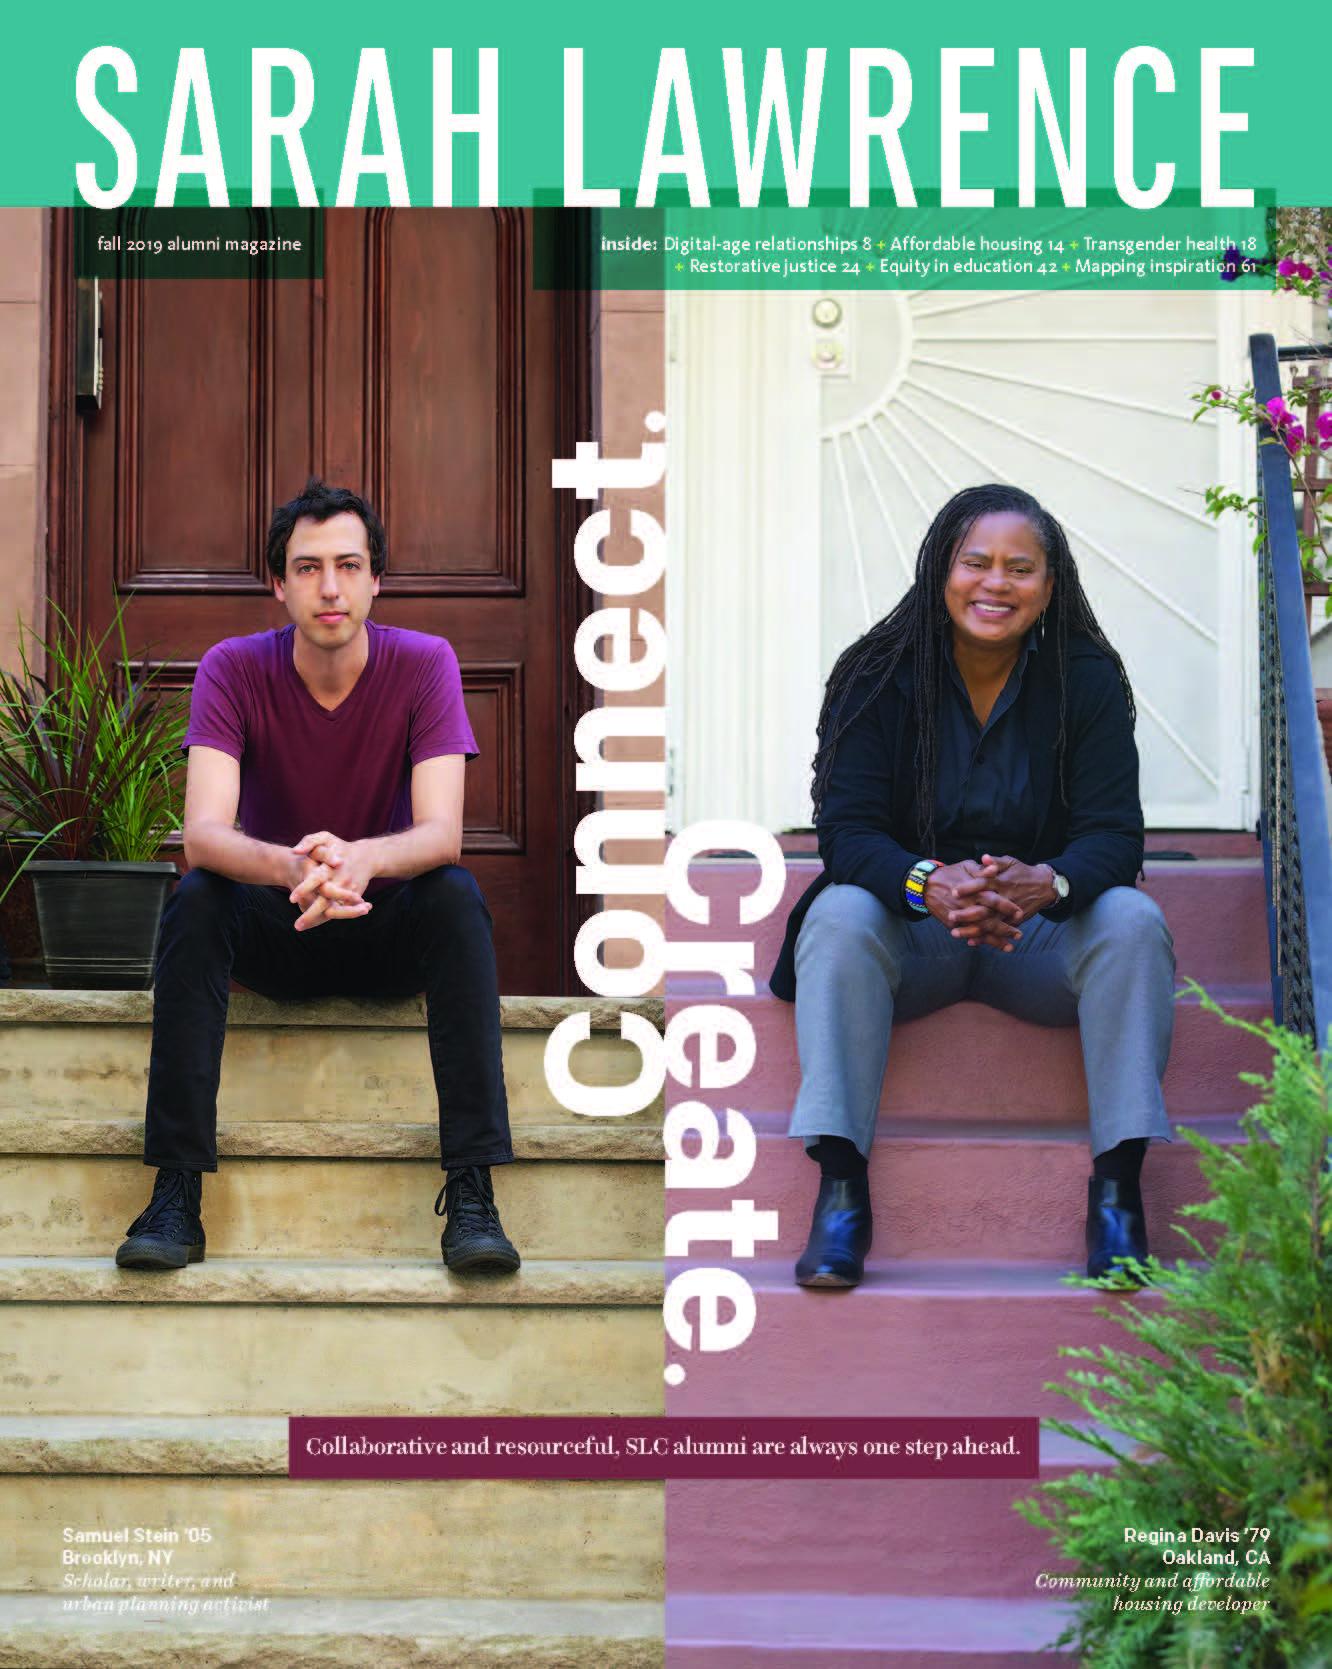 Sarah Lawrence magazine Fall 2019